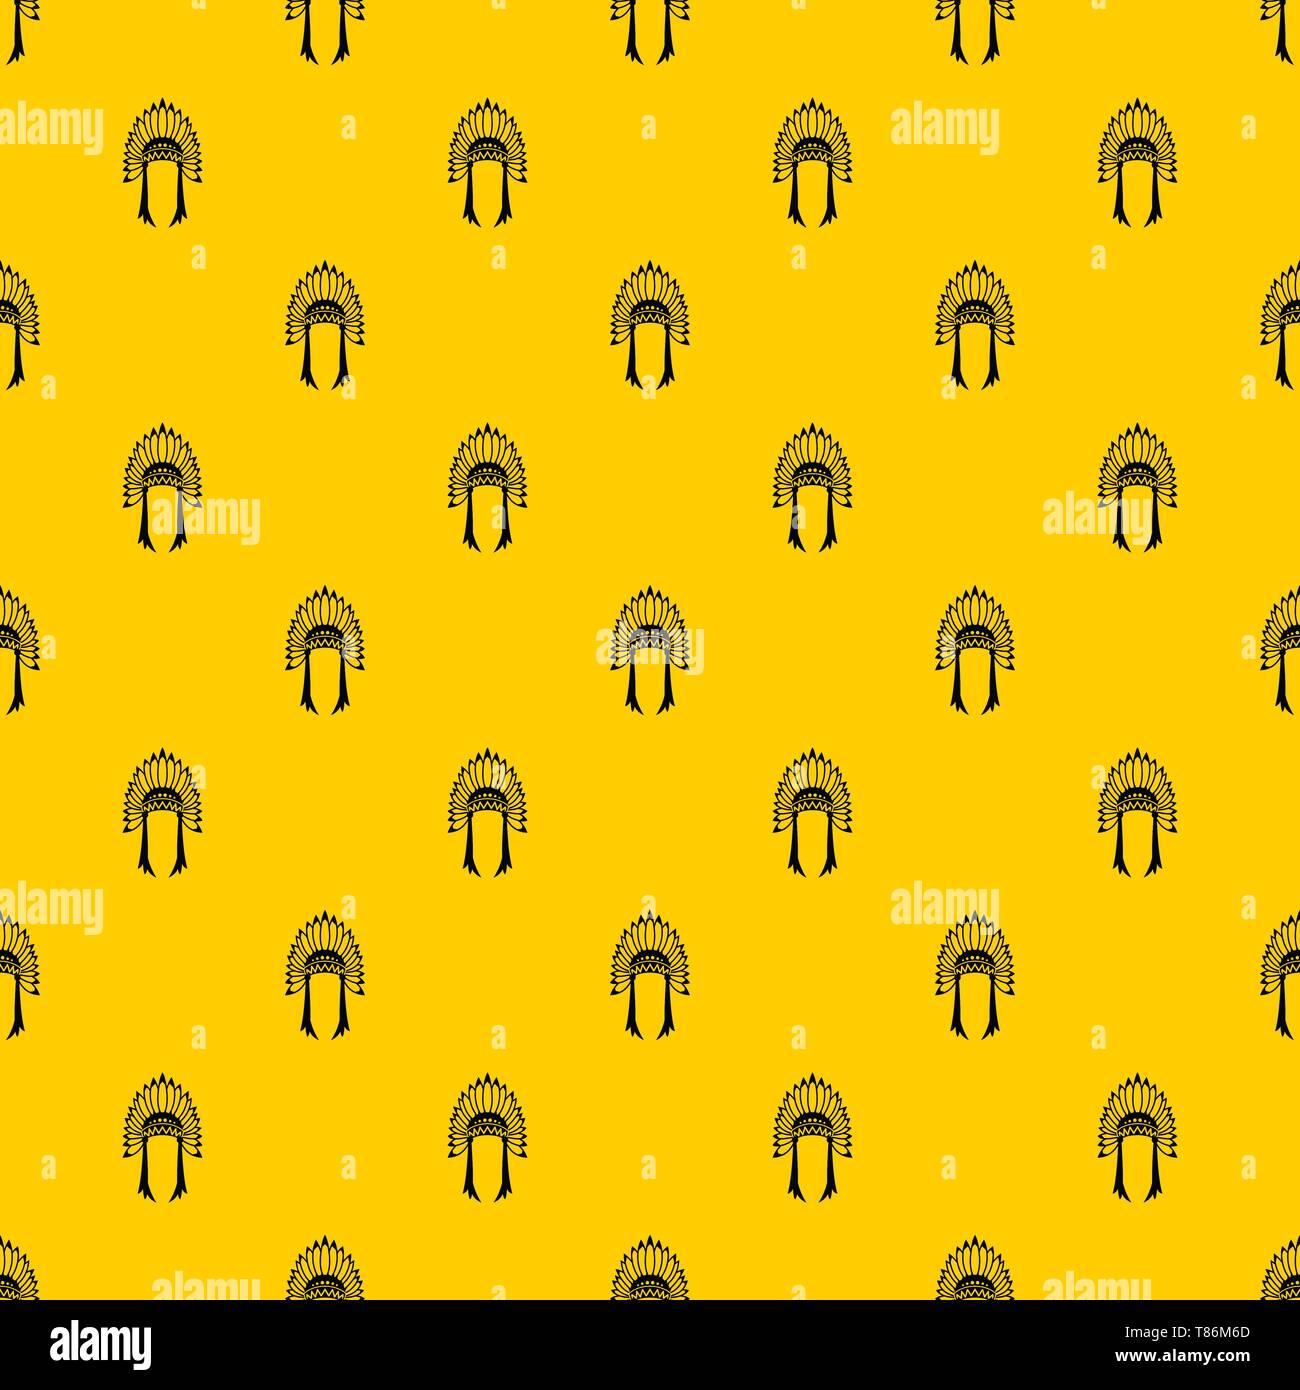 Indian headdress pattern vector - Stock Image